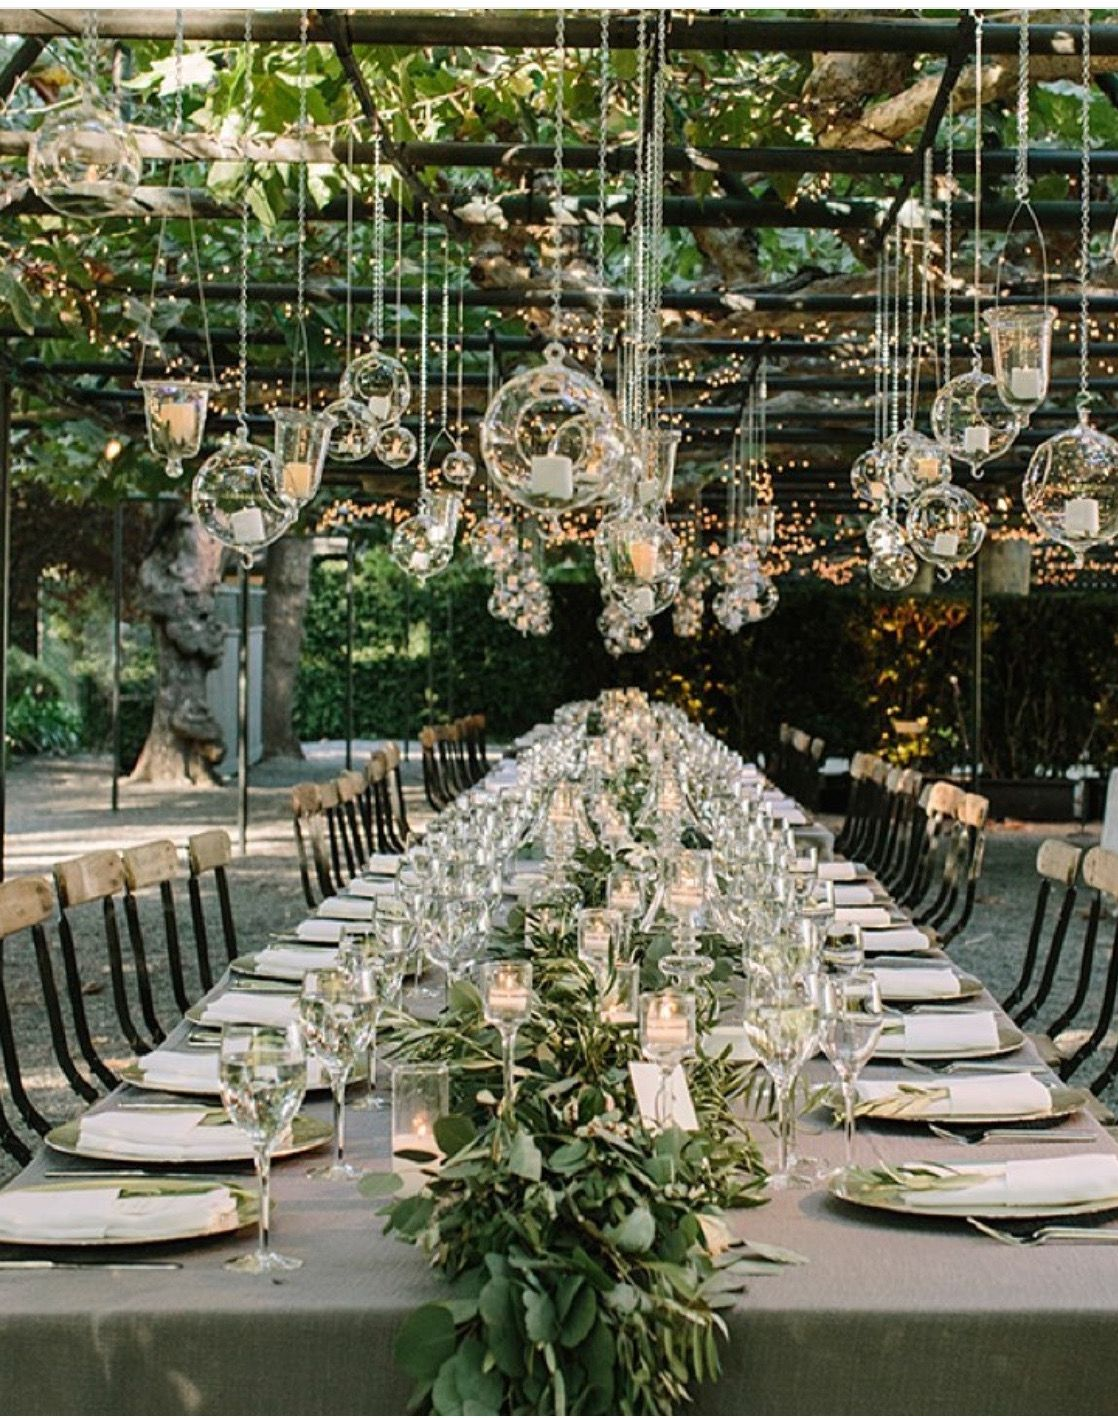 Garden event decor  wedding decor  garlands along table  hanging votives and lights